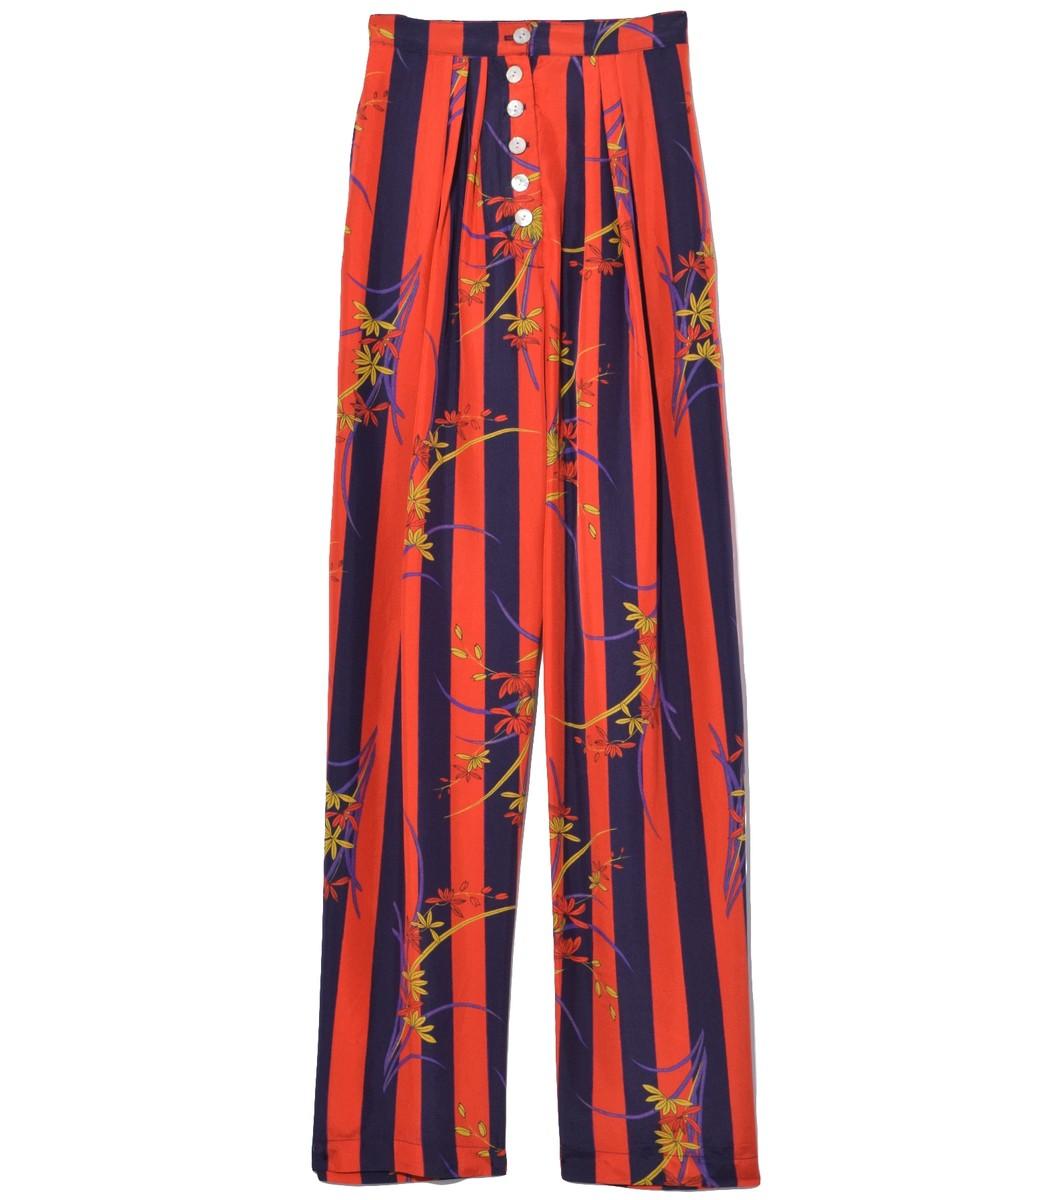 Raquel Allegra Pants Button Front Trouser in Nightshade Stripe